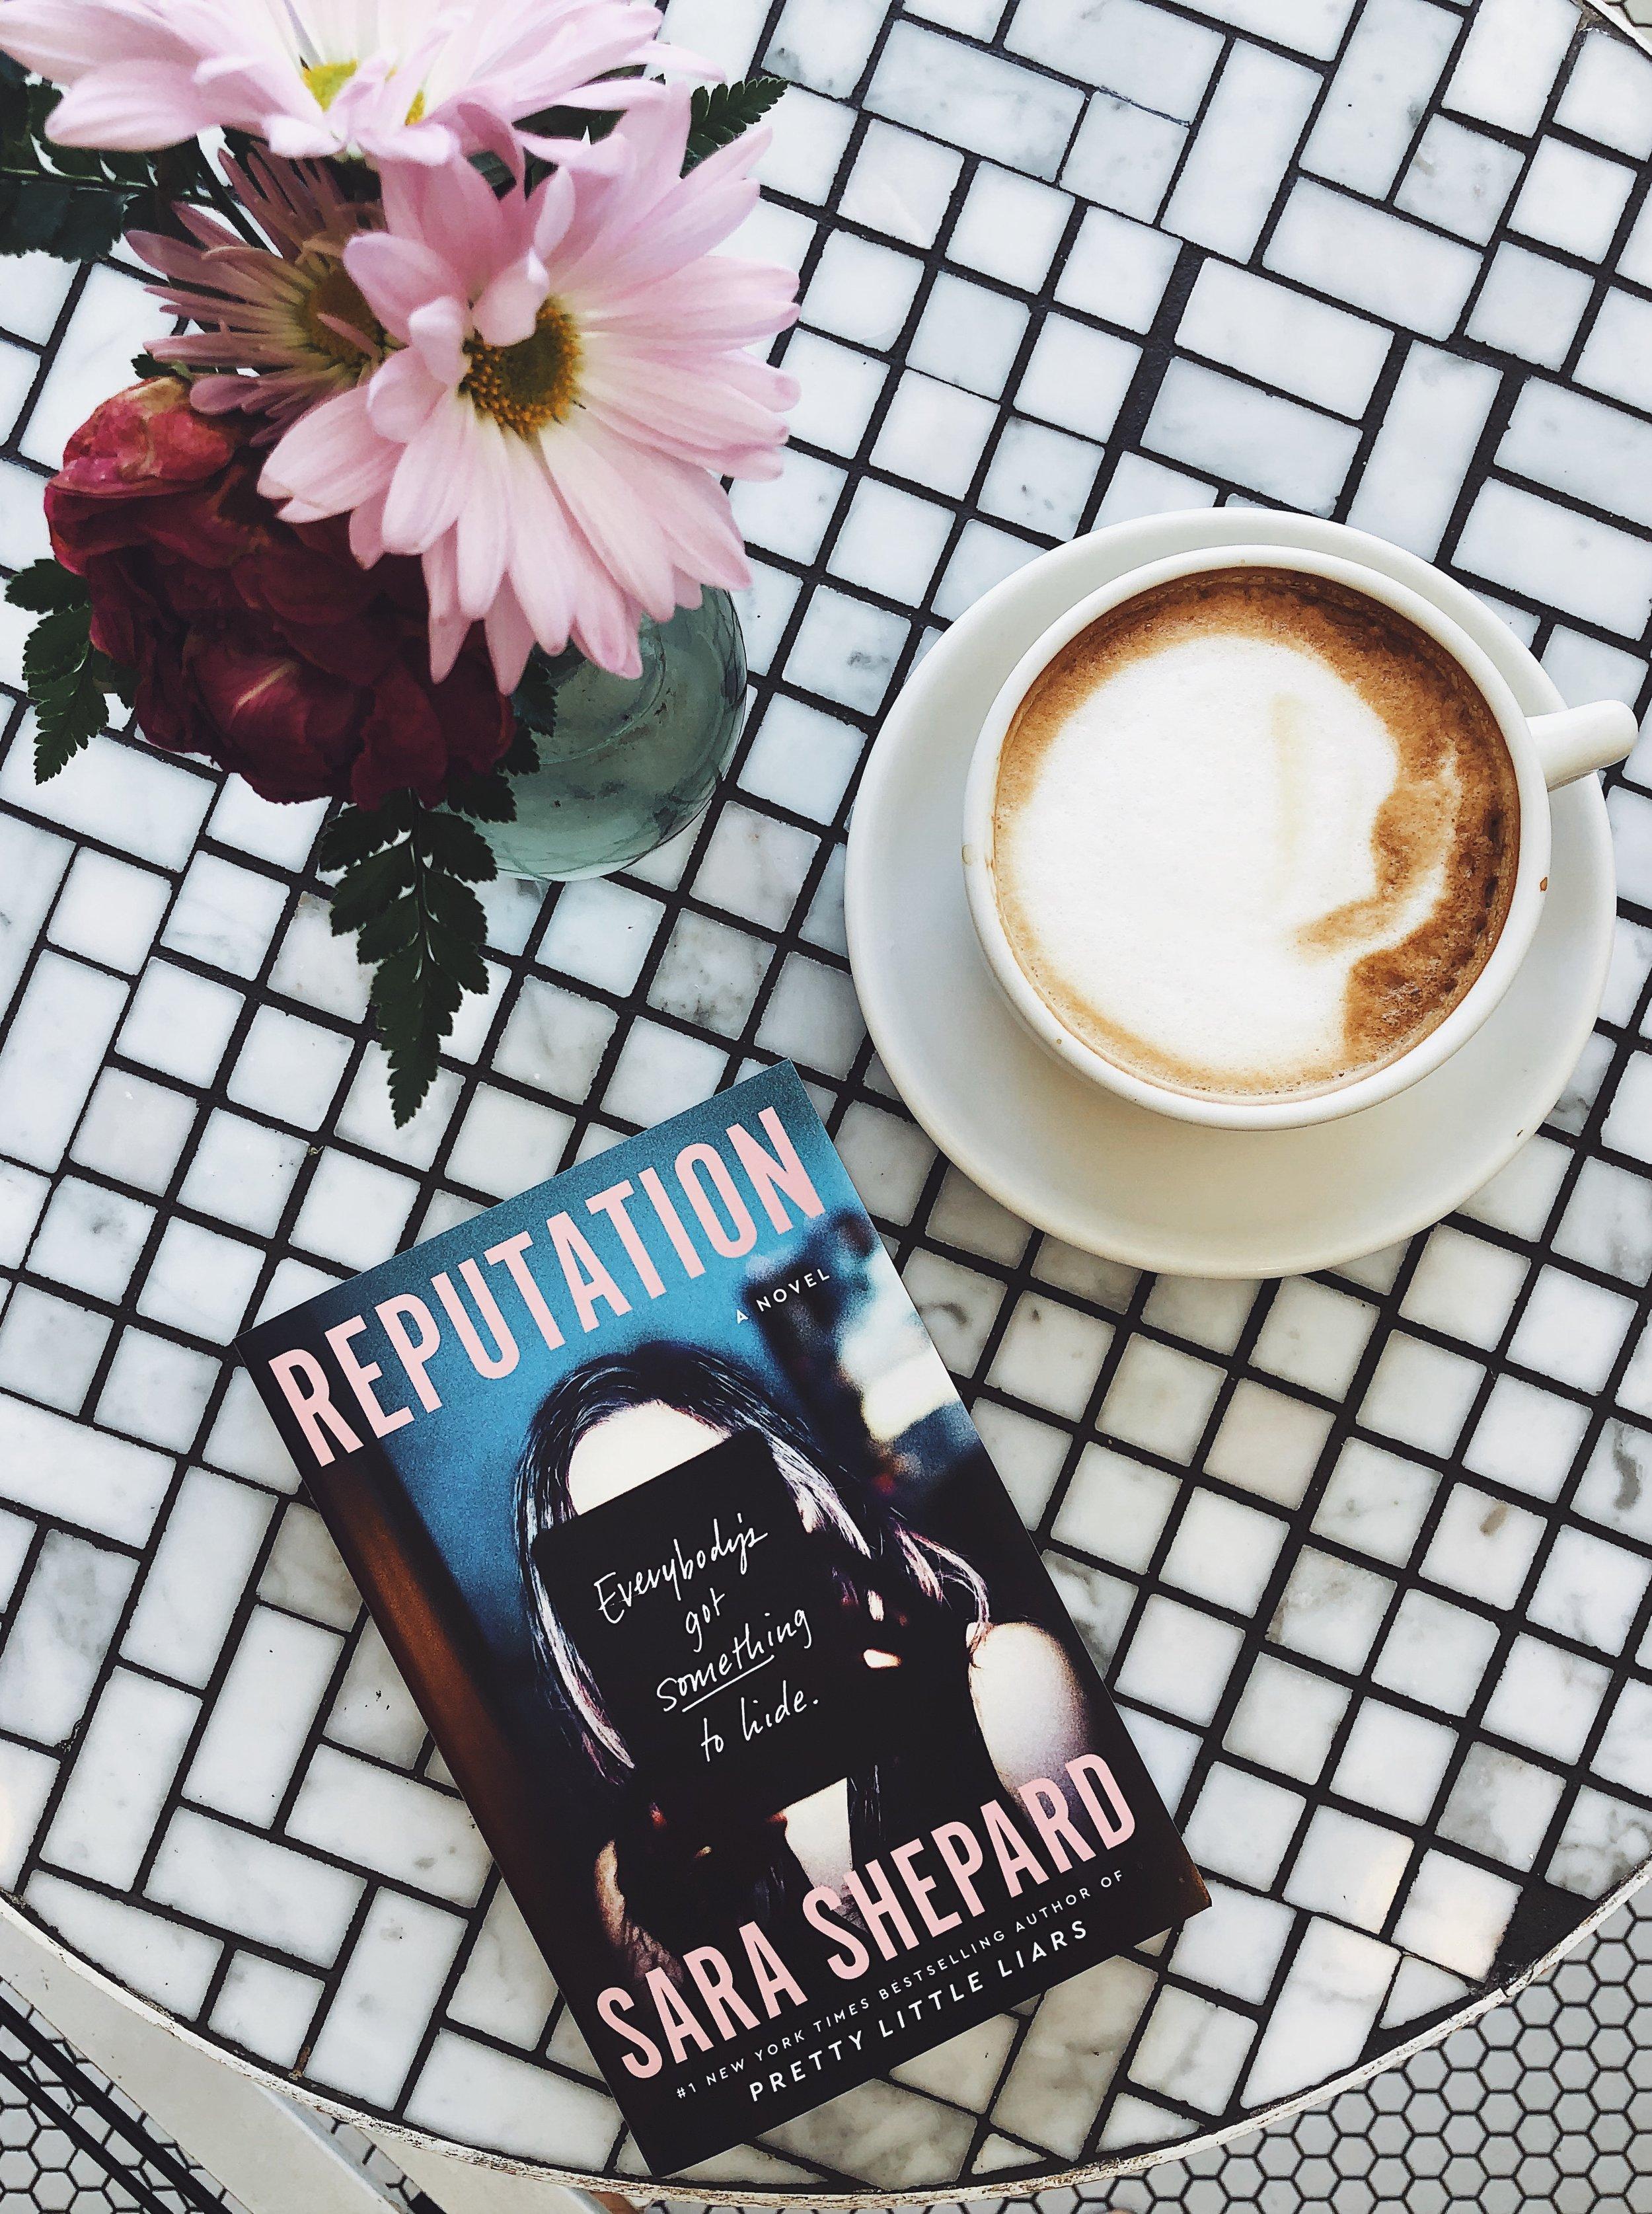 Reputation-Sara Shepard2.JPG